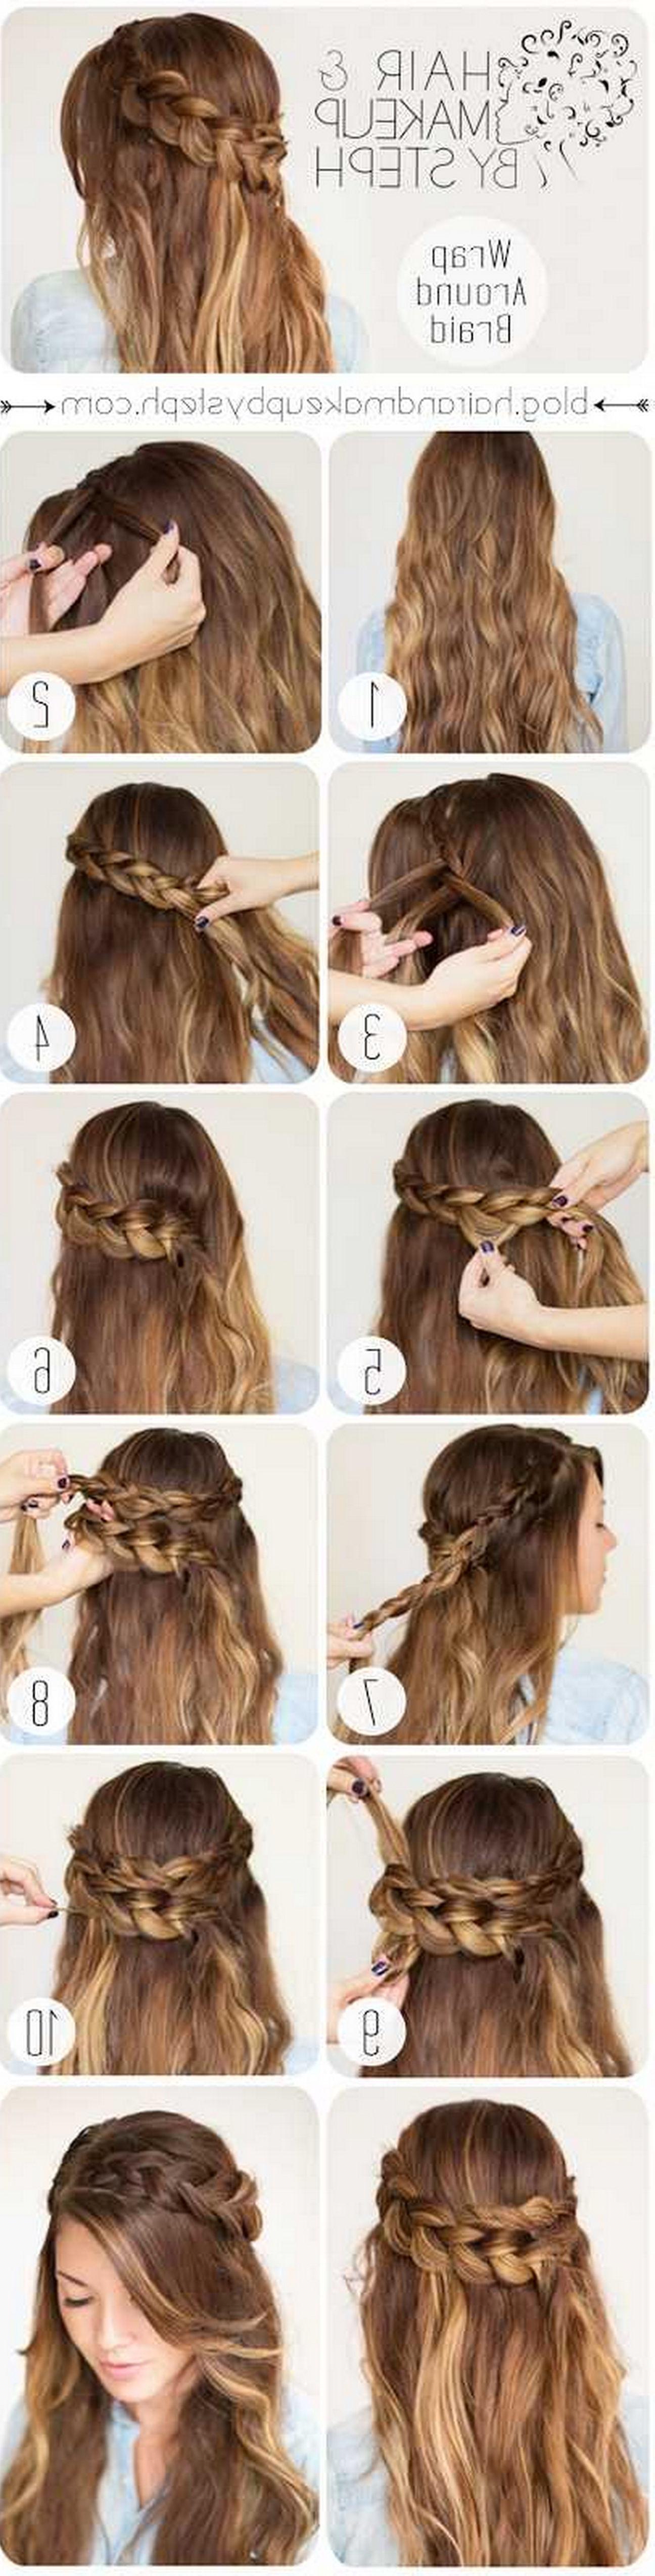 Home braids new wrap around braid hairstyles hair trendsprom